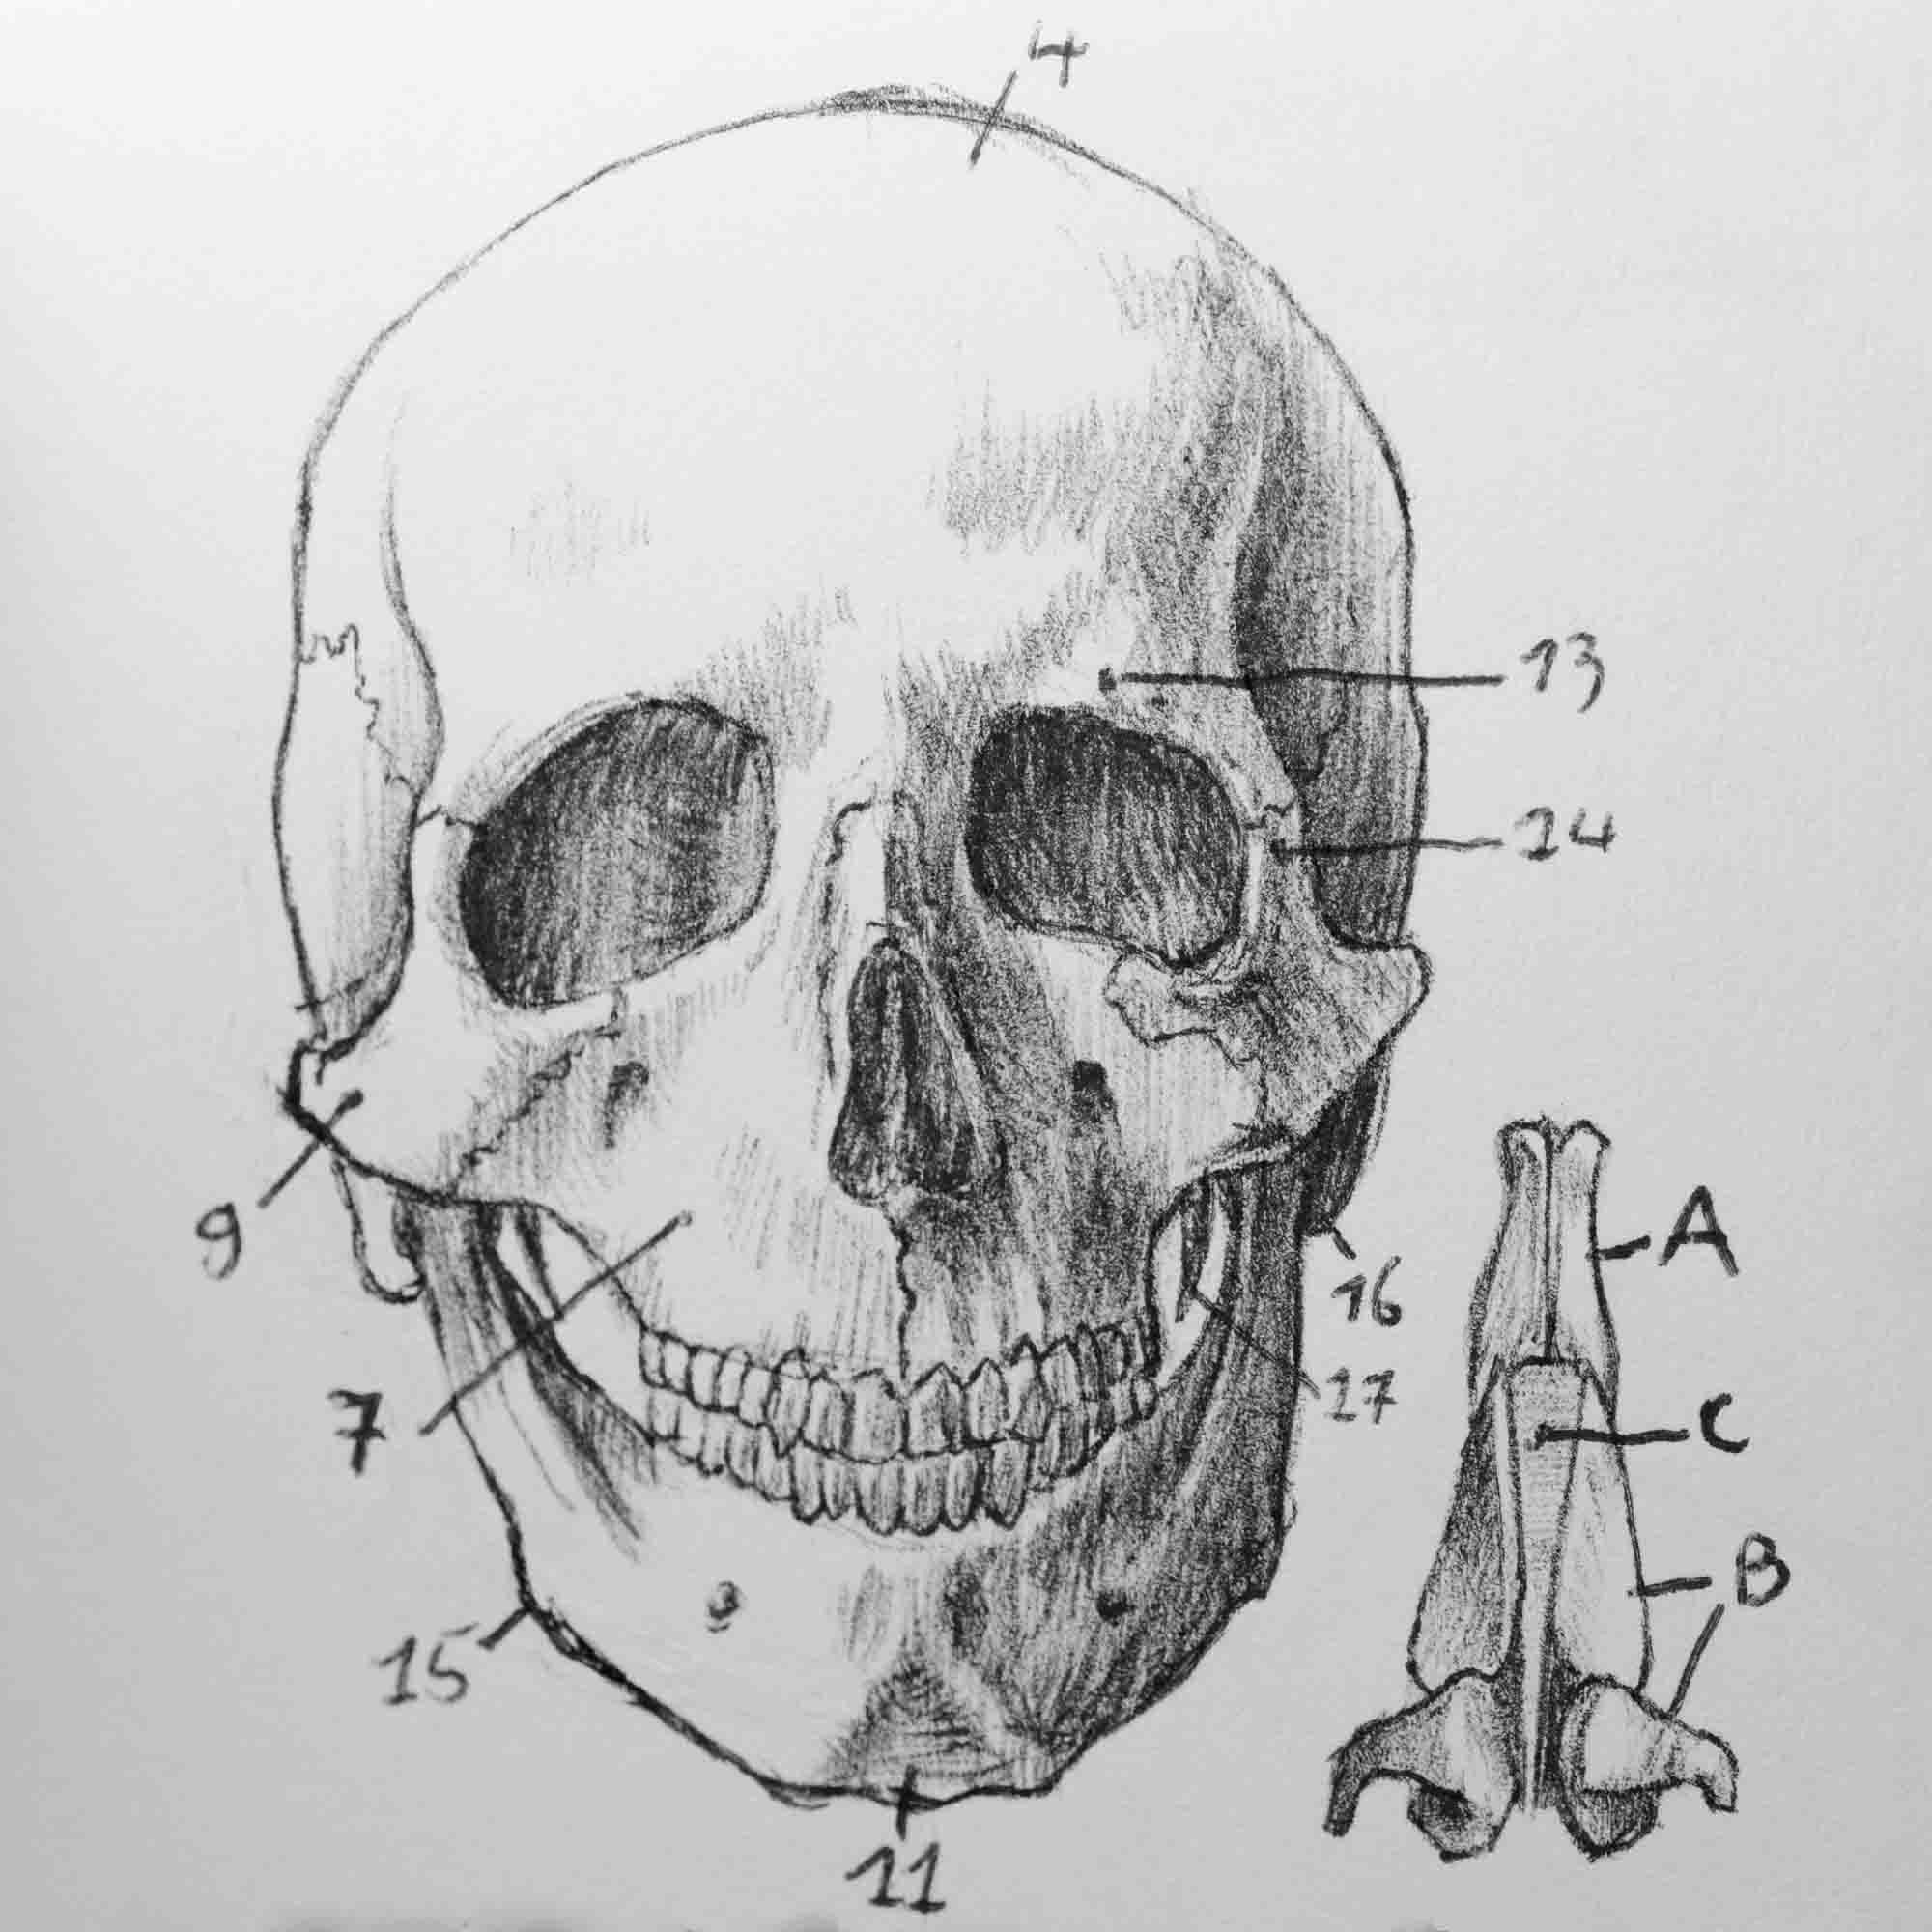 book_anatomical_studies_header.jpg